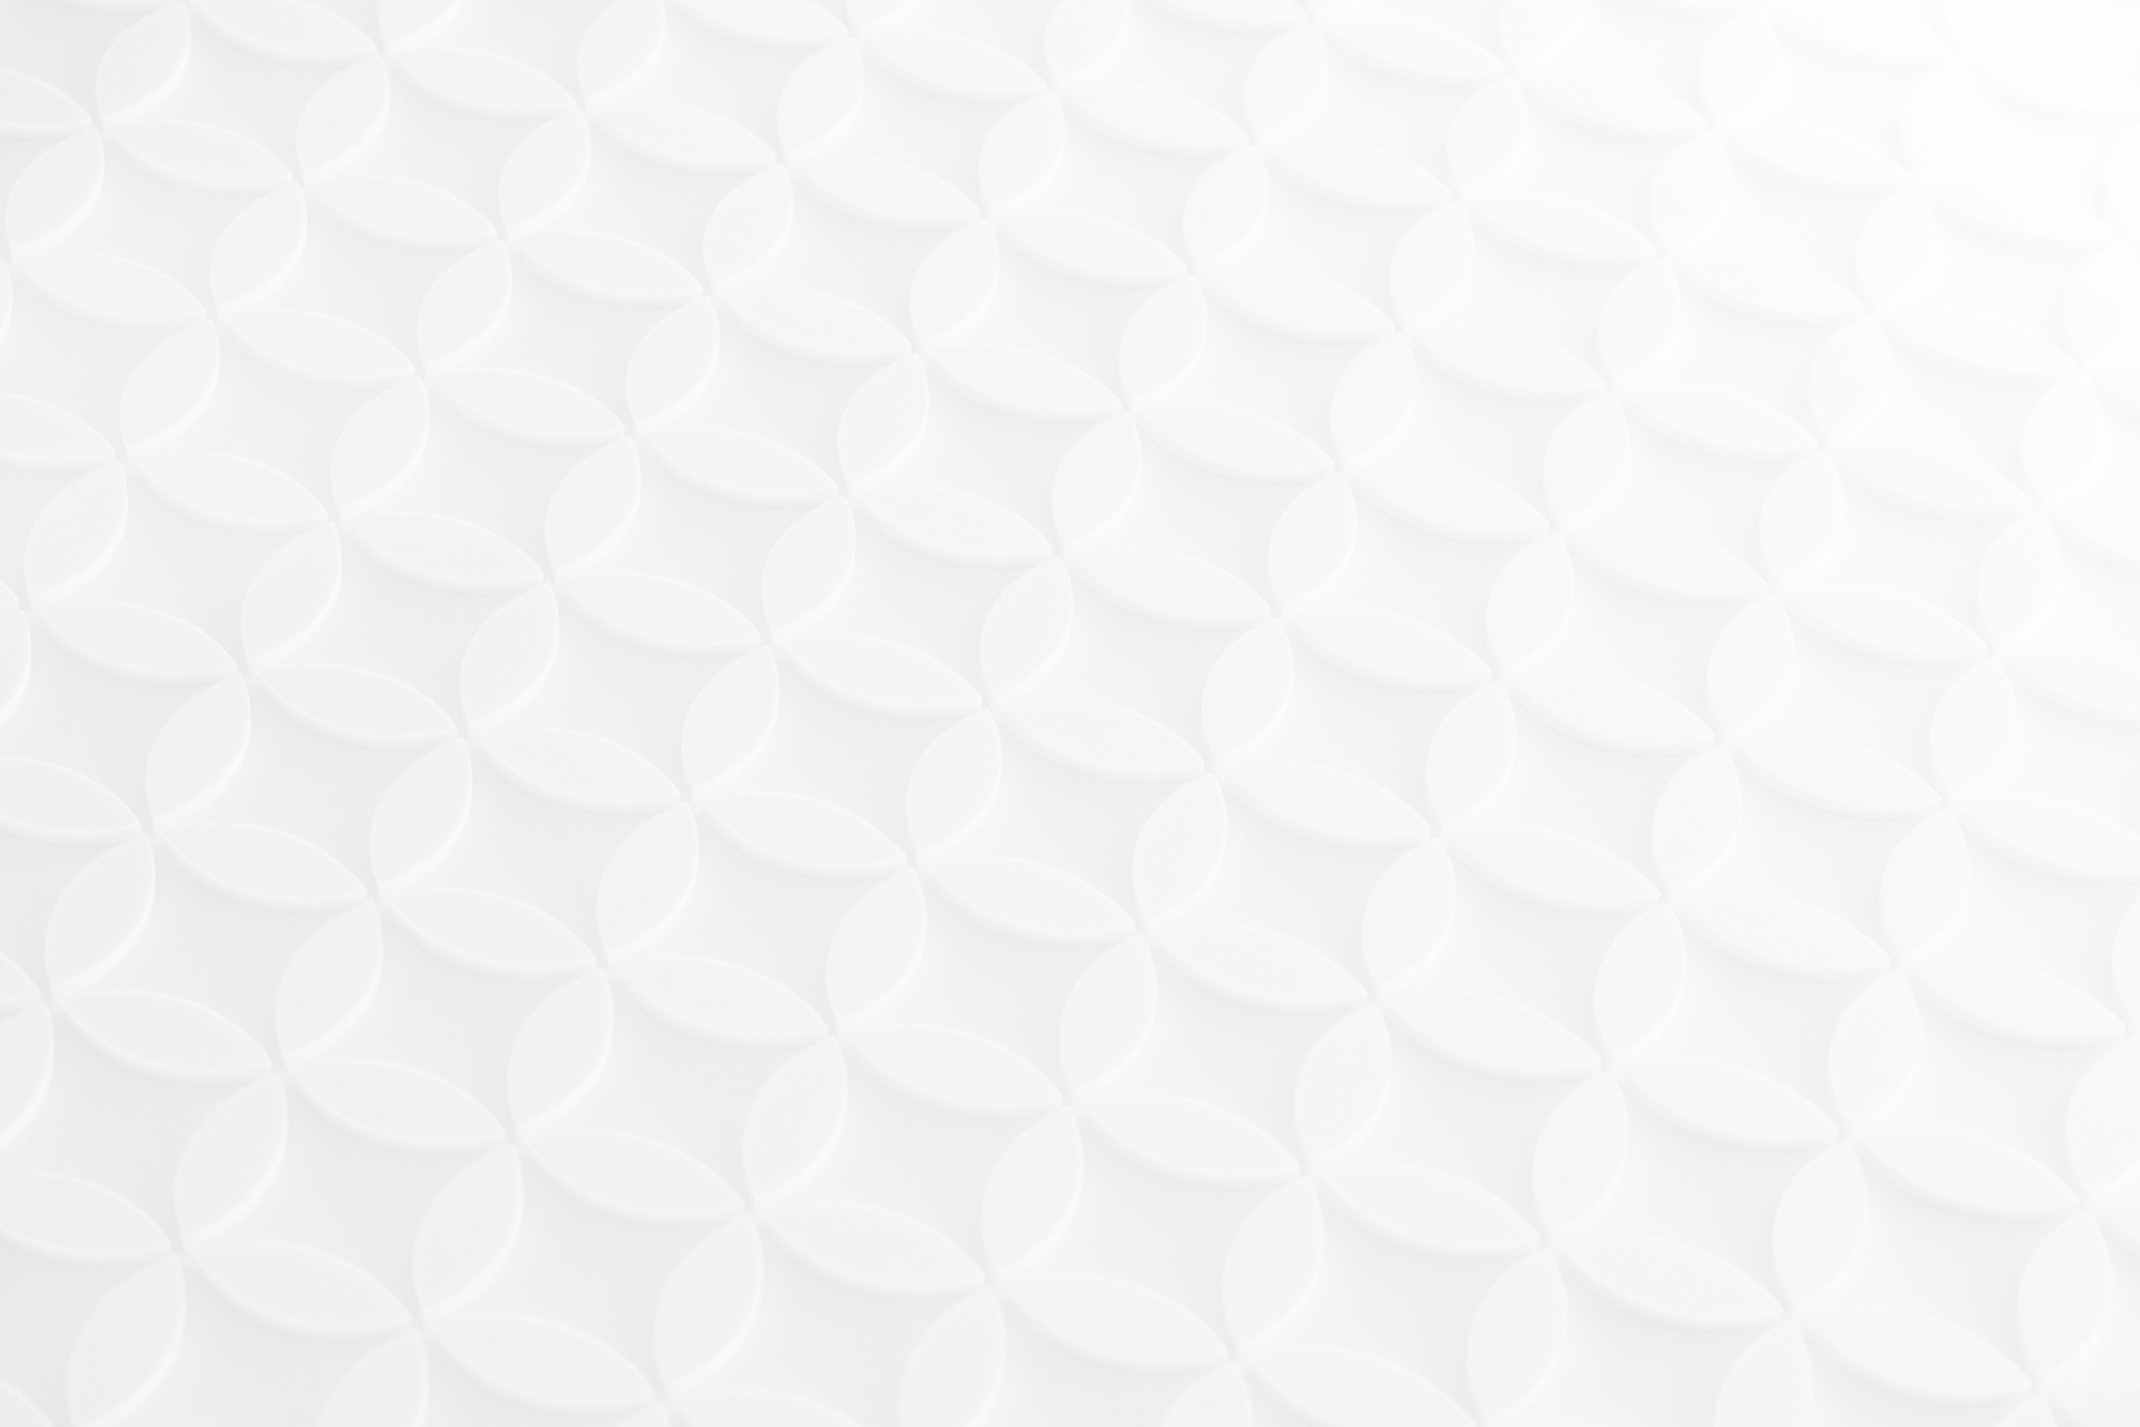 geometric circles transsparent